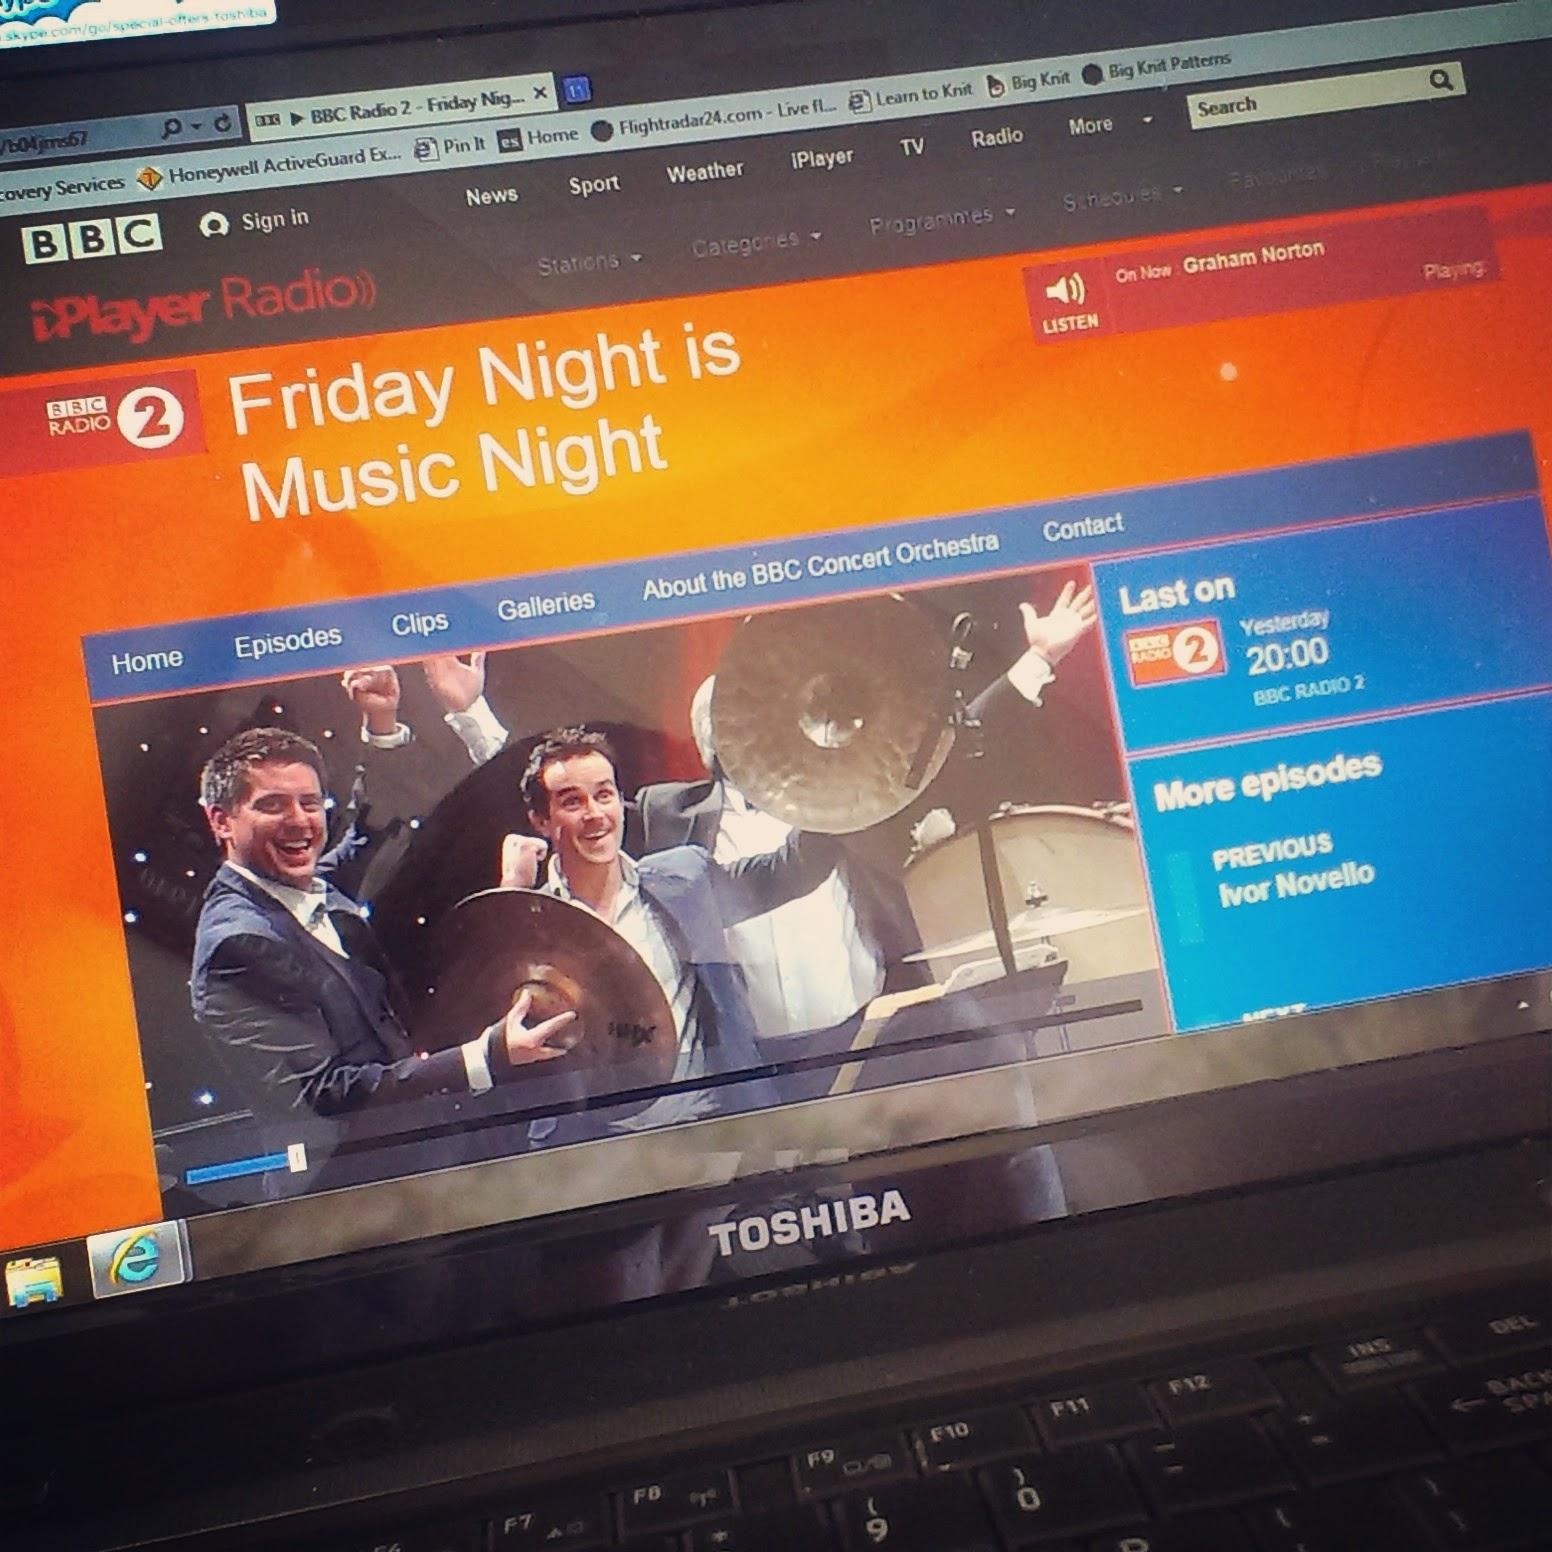 Listening to Friday Night is Music Night